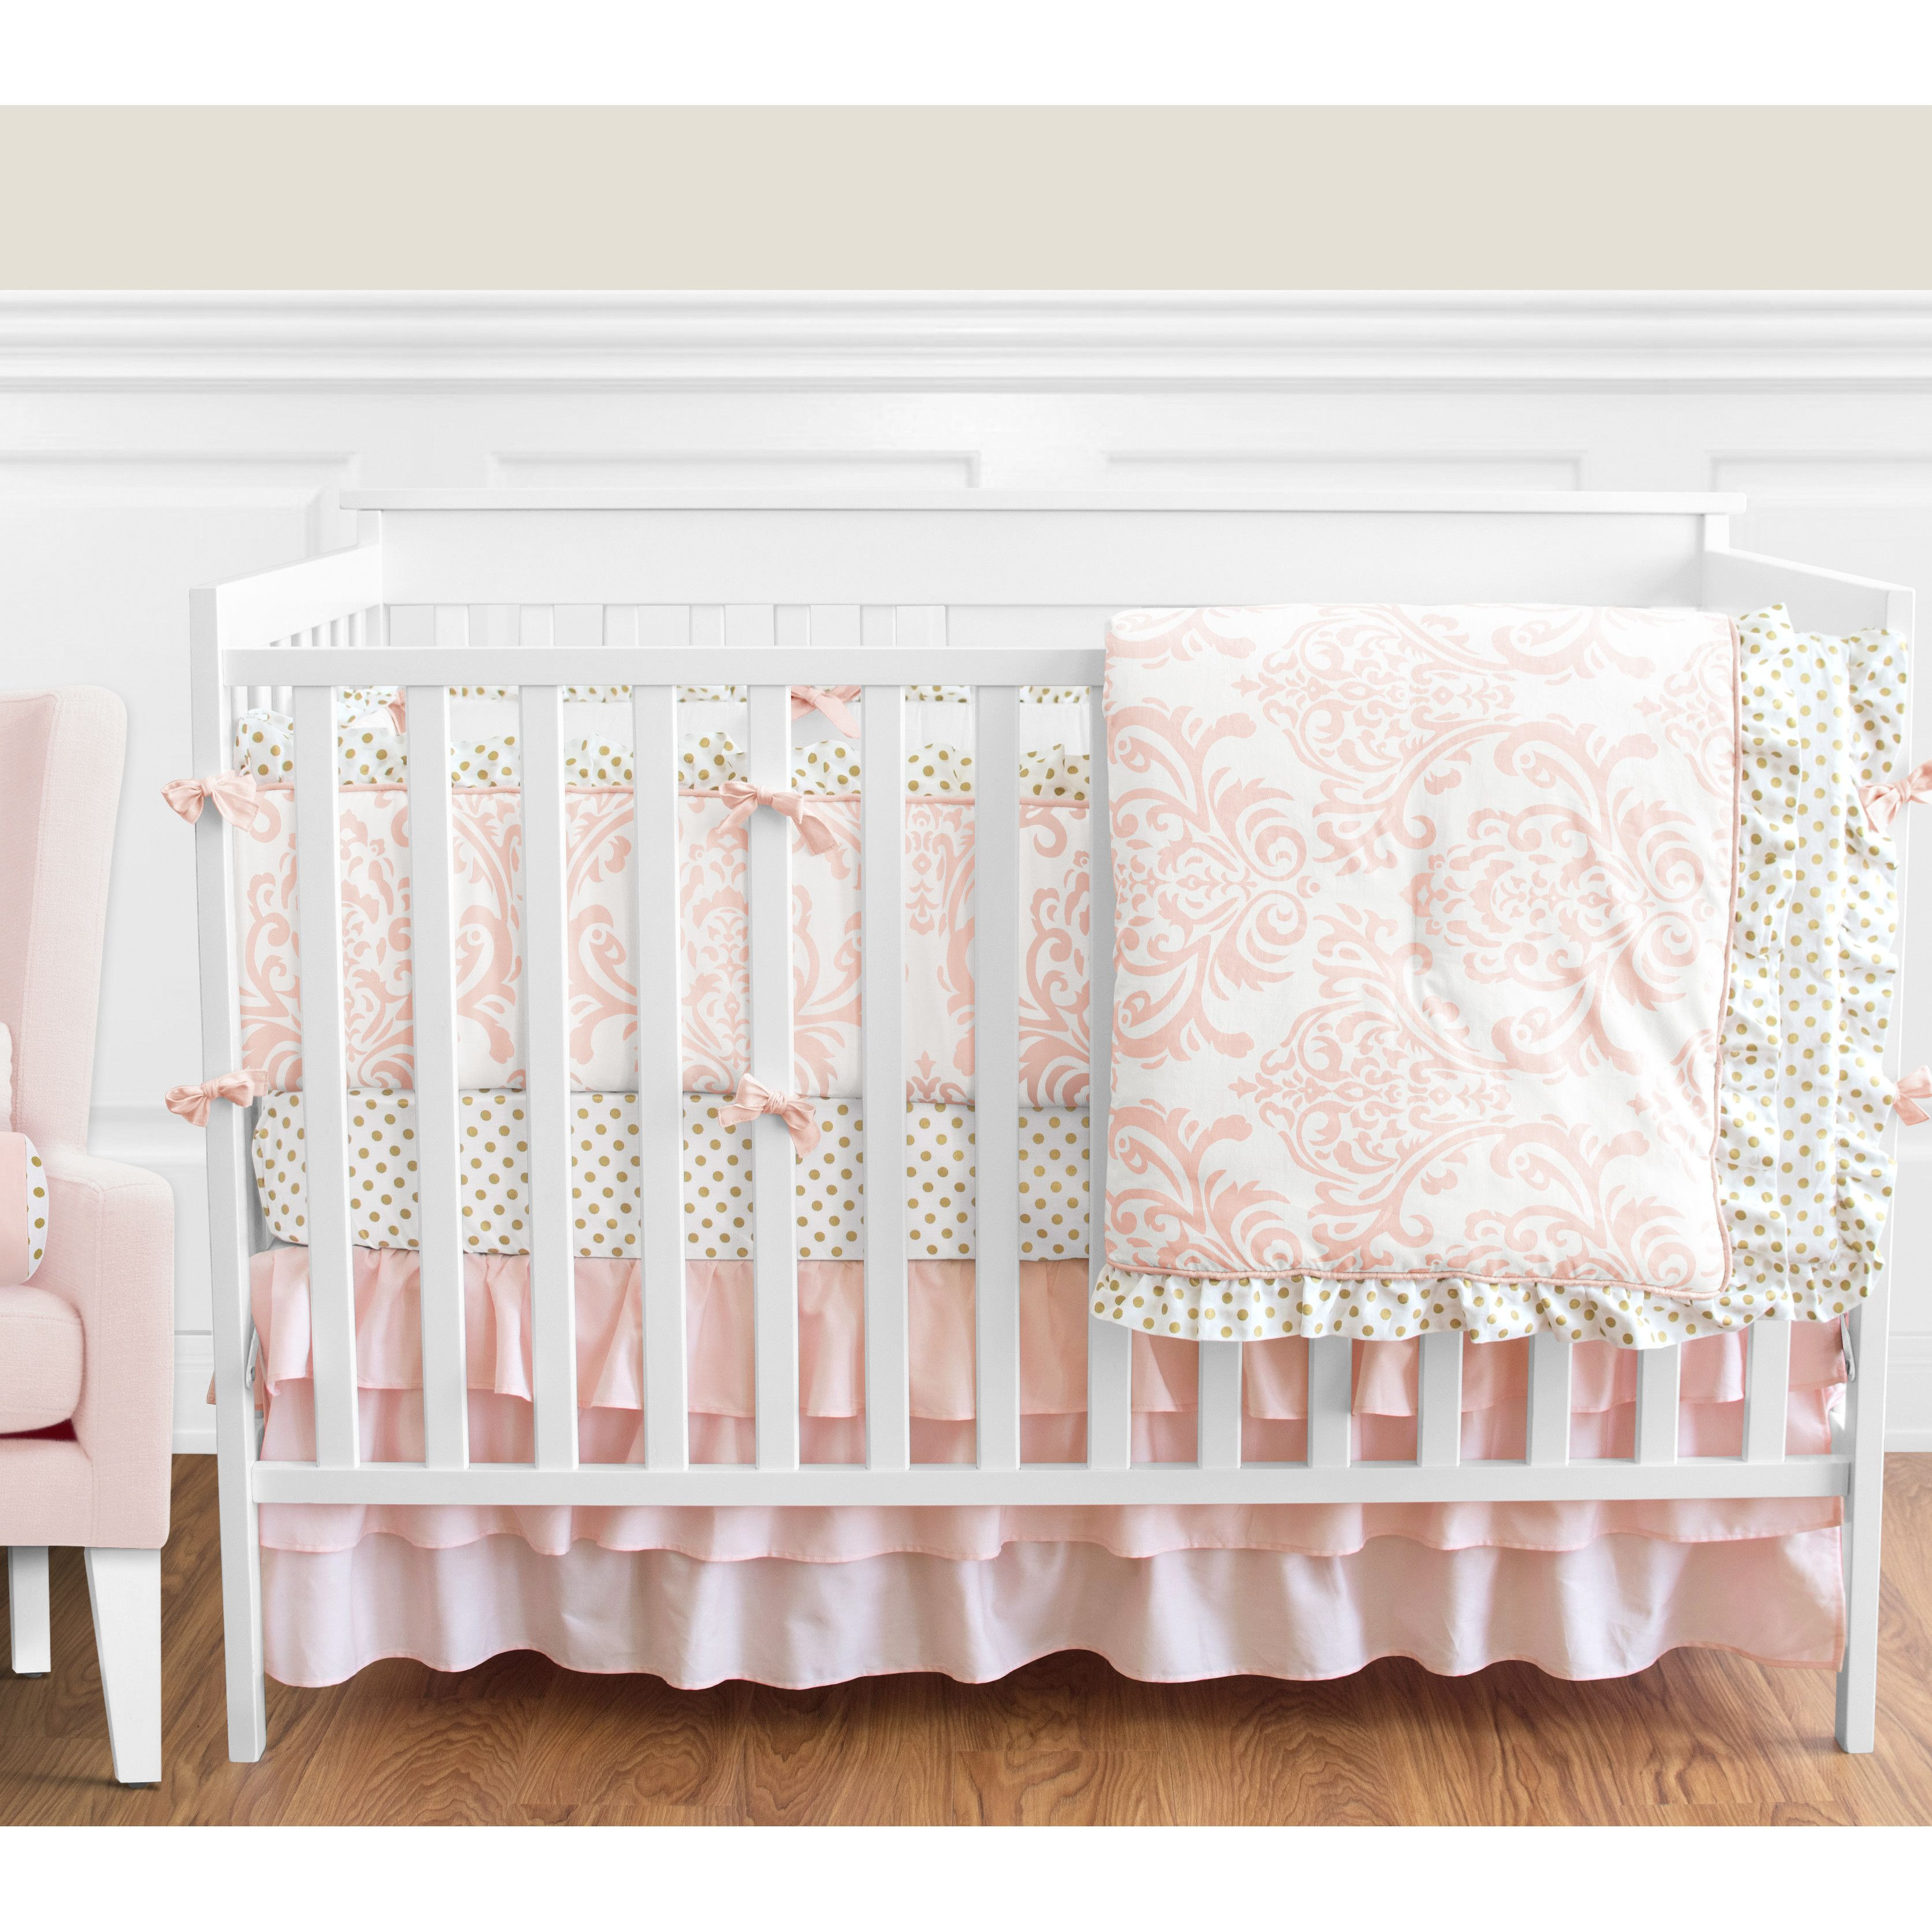 find and crib guides cheap deals girls girl bedding designs cheetah brown sweet cribs kurta shopping print baby pink get animal jojo on quotations set